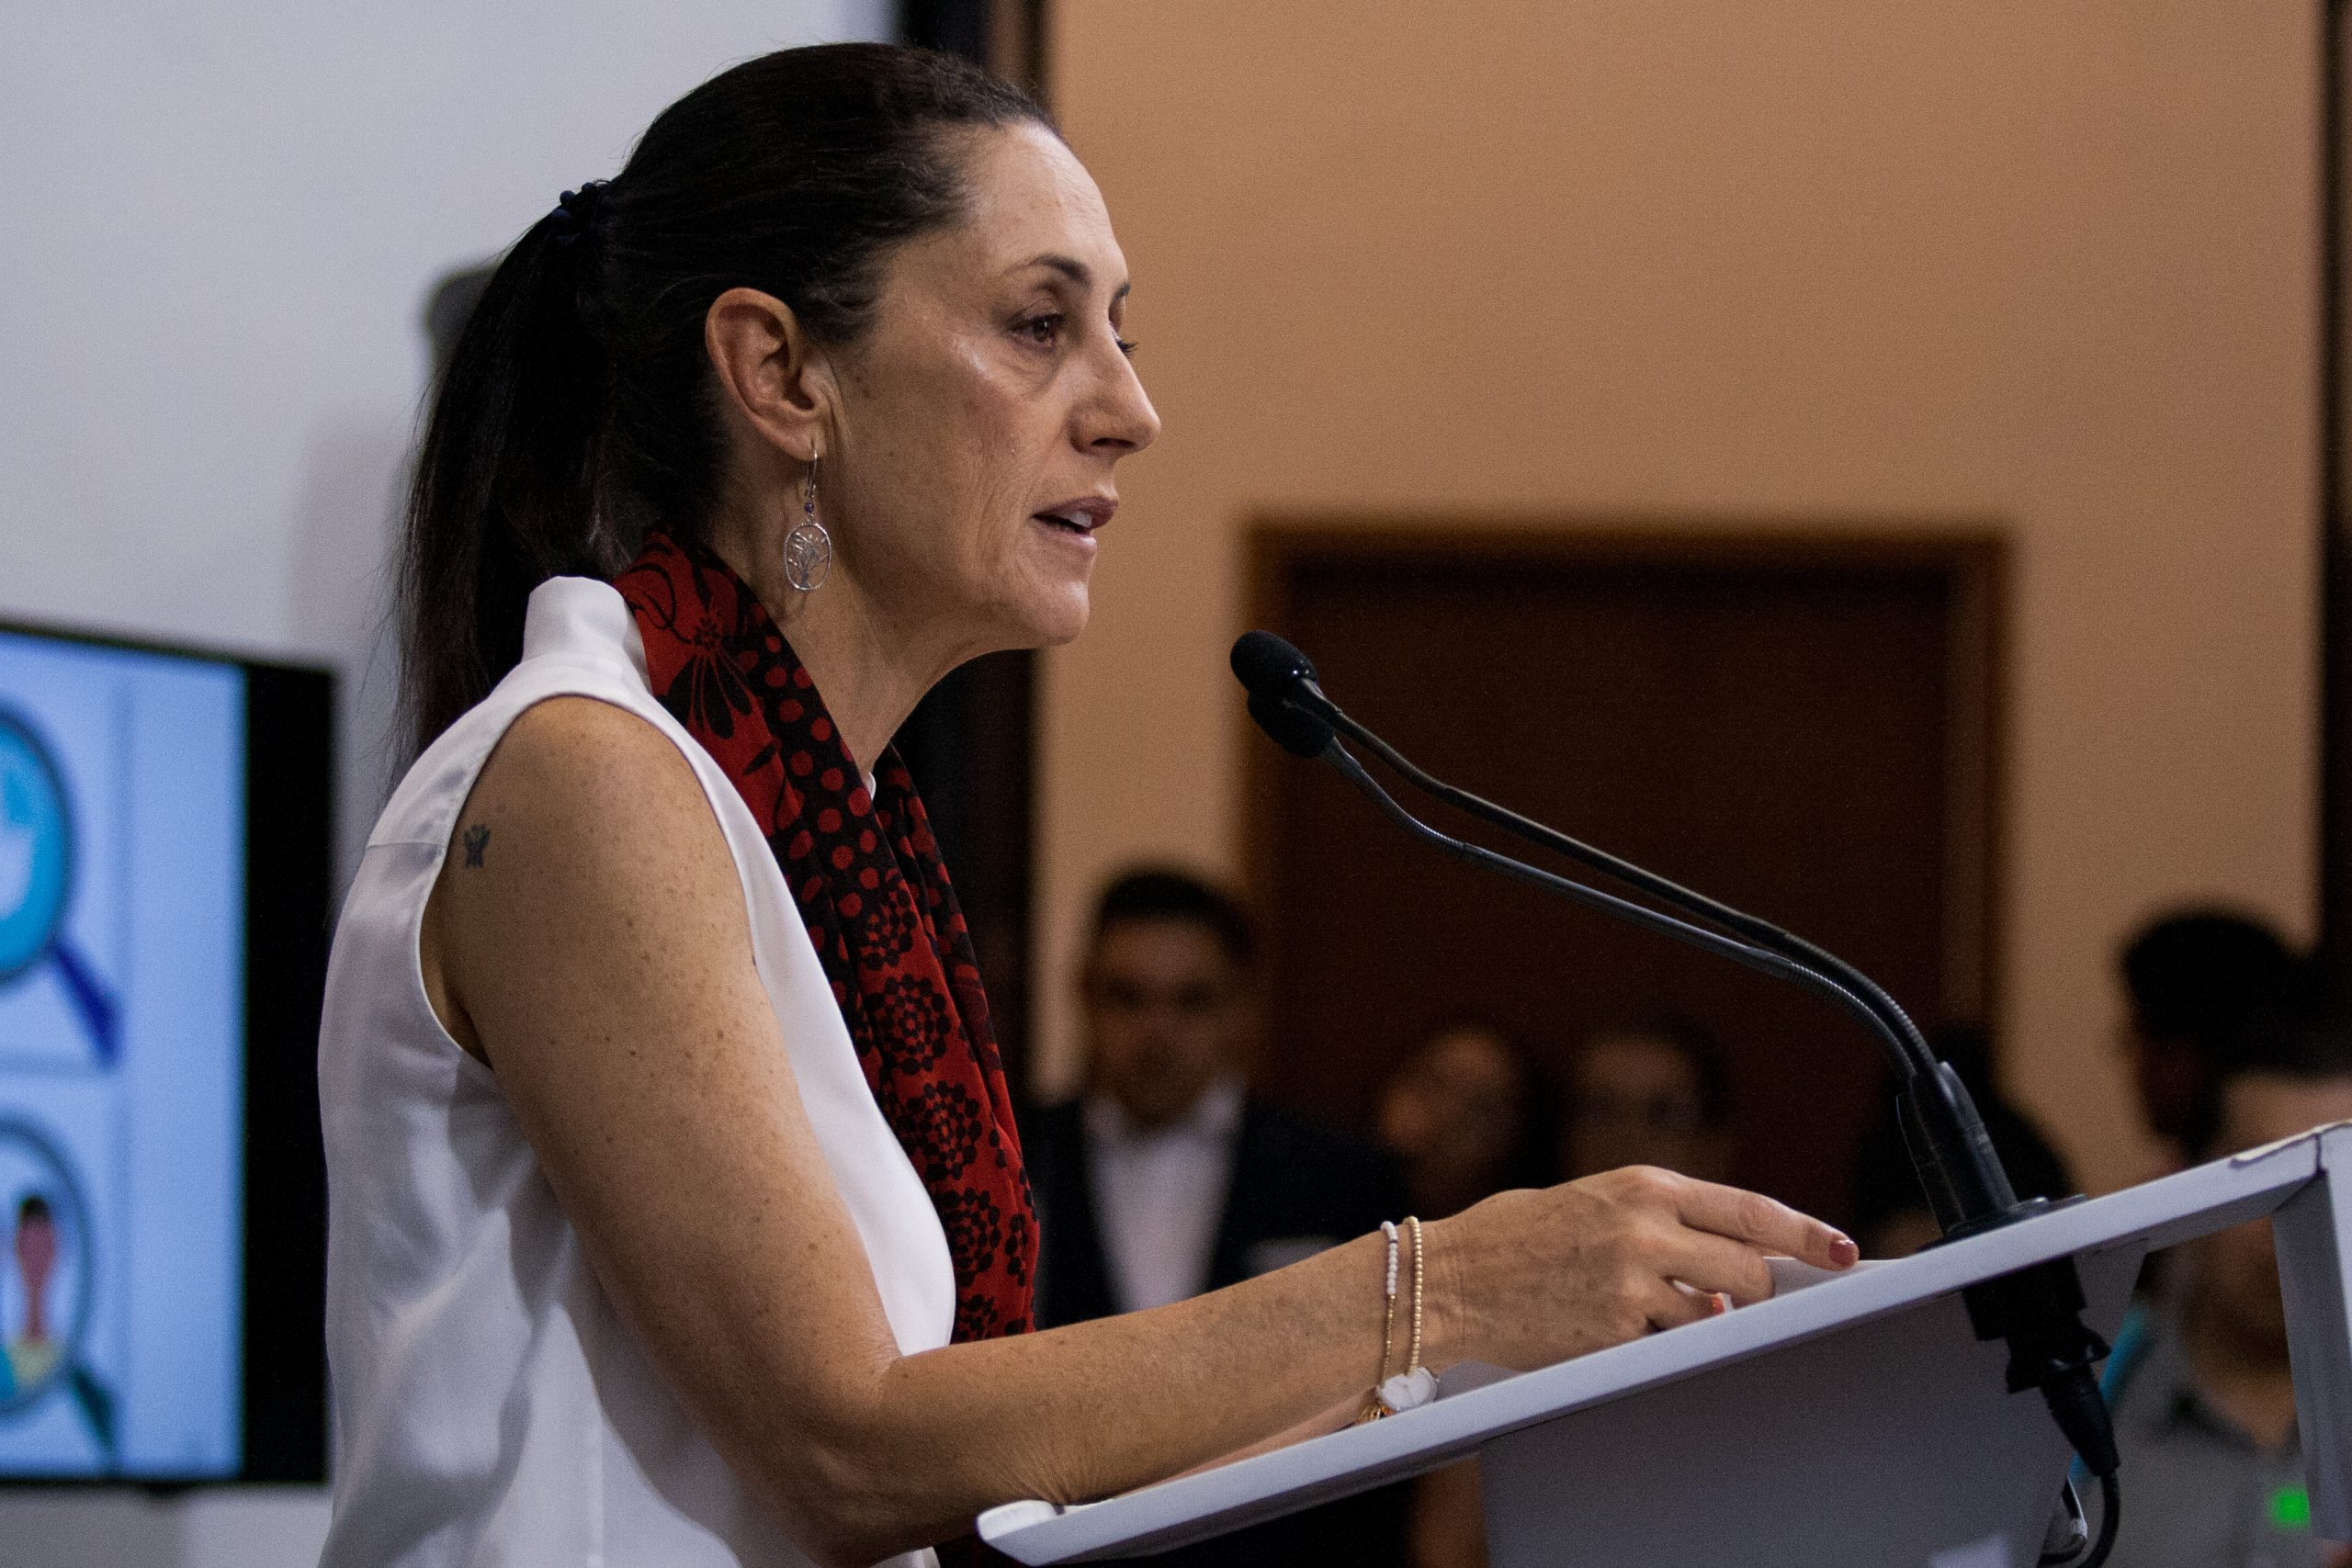 Claudia Sheinbaum alcaldes que buscan reelegirse por algún cargo de elección popular se separen ya de su función actual.